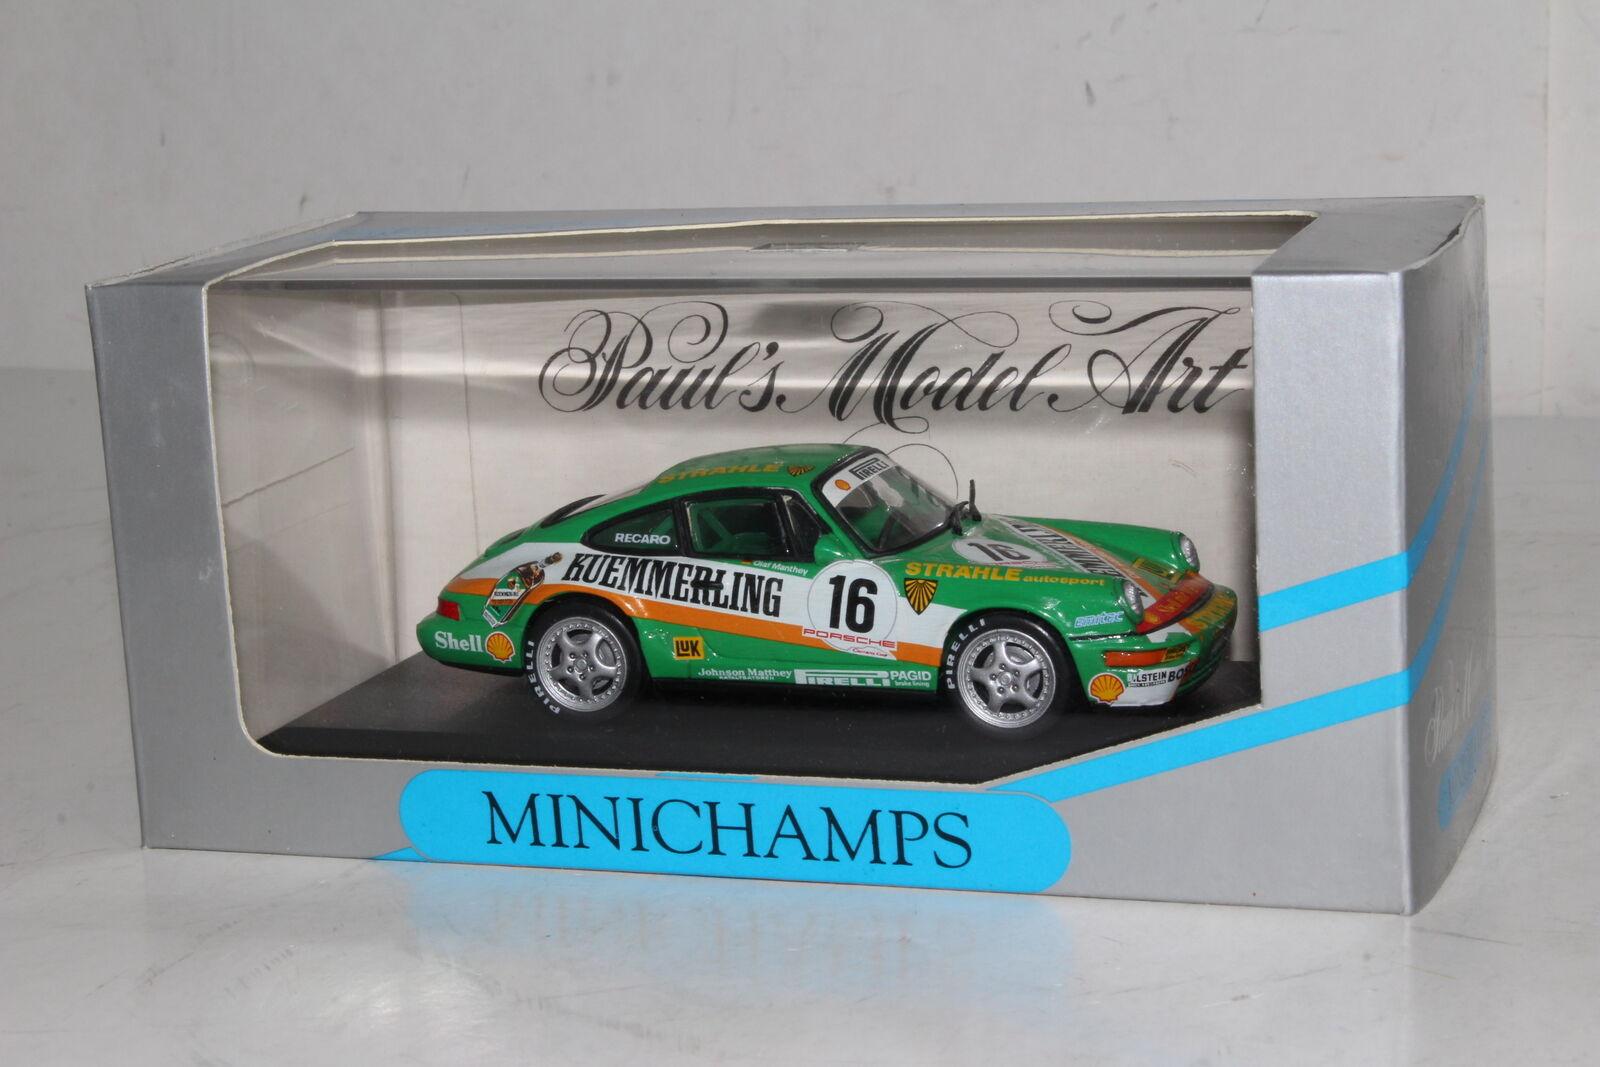 calidad auténtica Minichamps de Metal  926016 Porsche 911 911 911 , Cup 1992 , Manthey Straehle Autosport  gran descuento